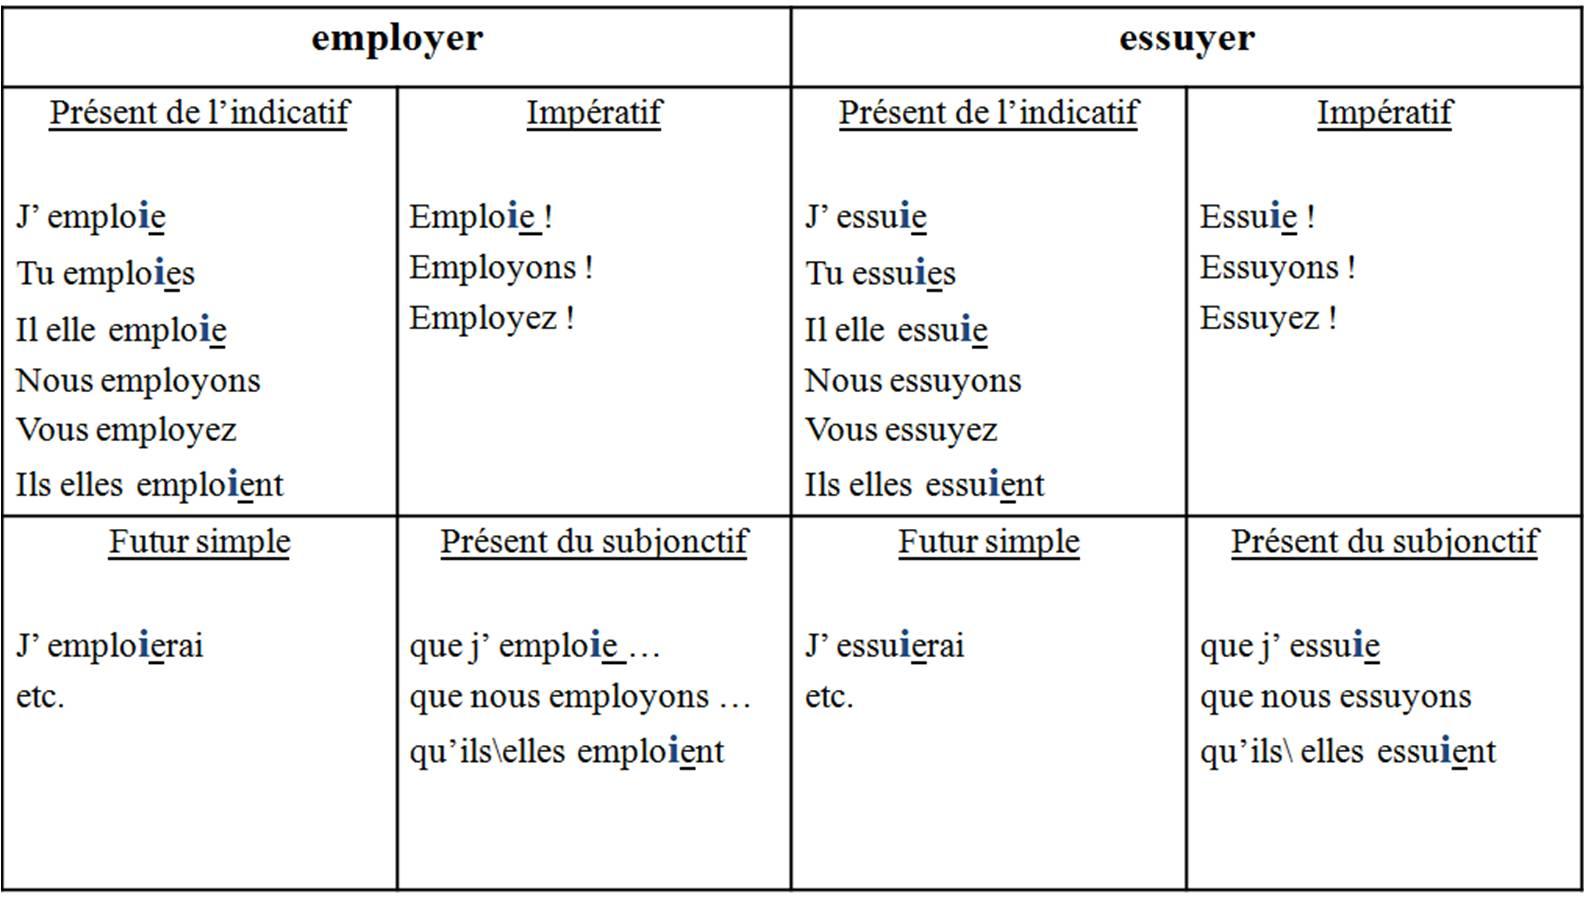 019 Essayer Conjugation French Essay Example Breathtaking Future Verb Past Full